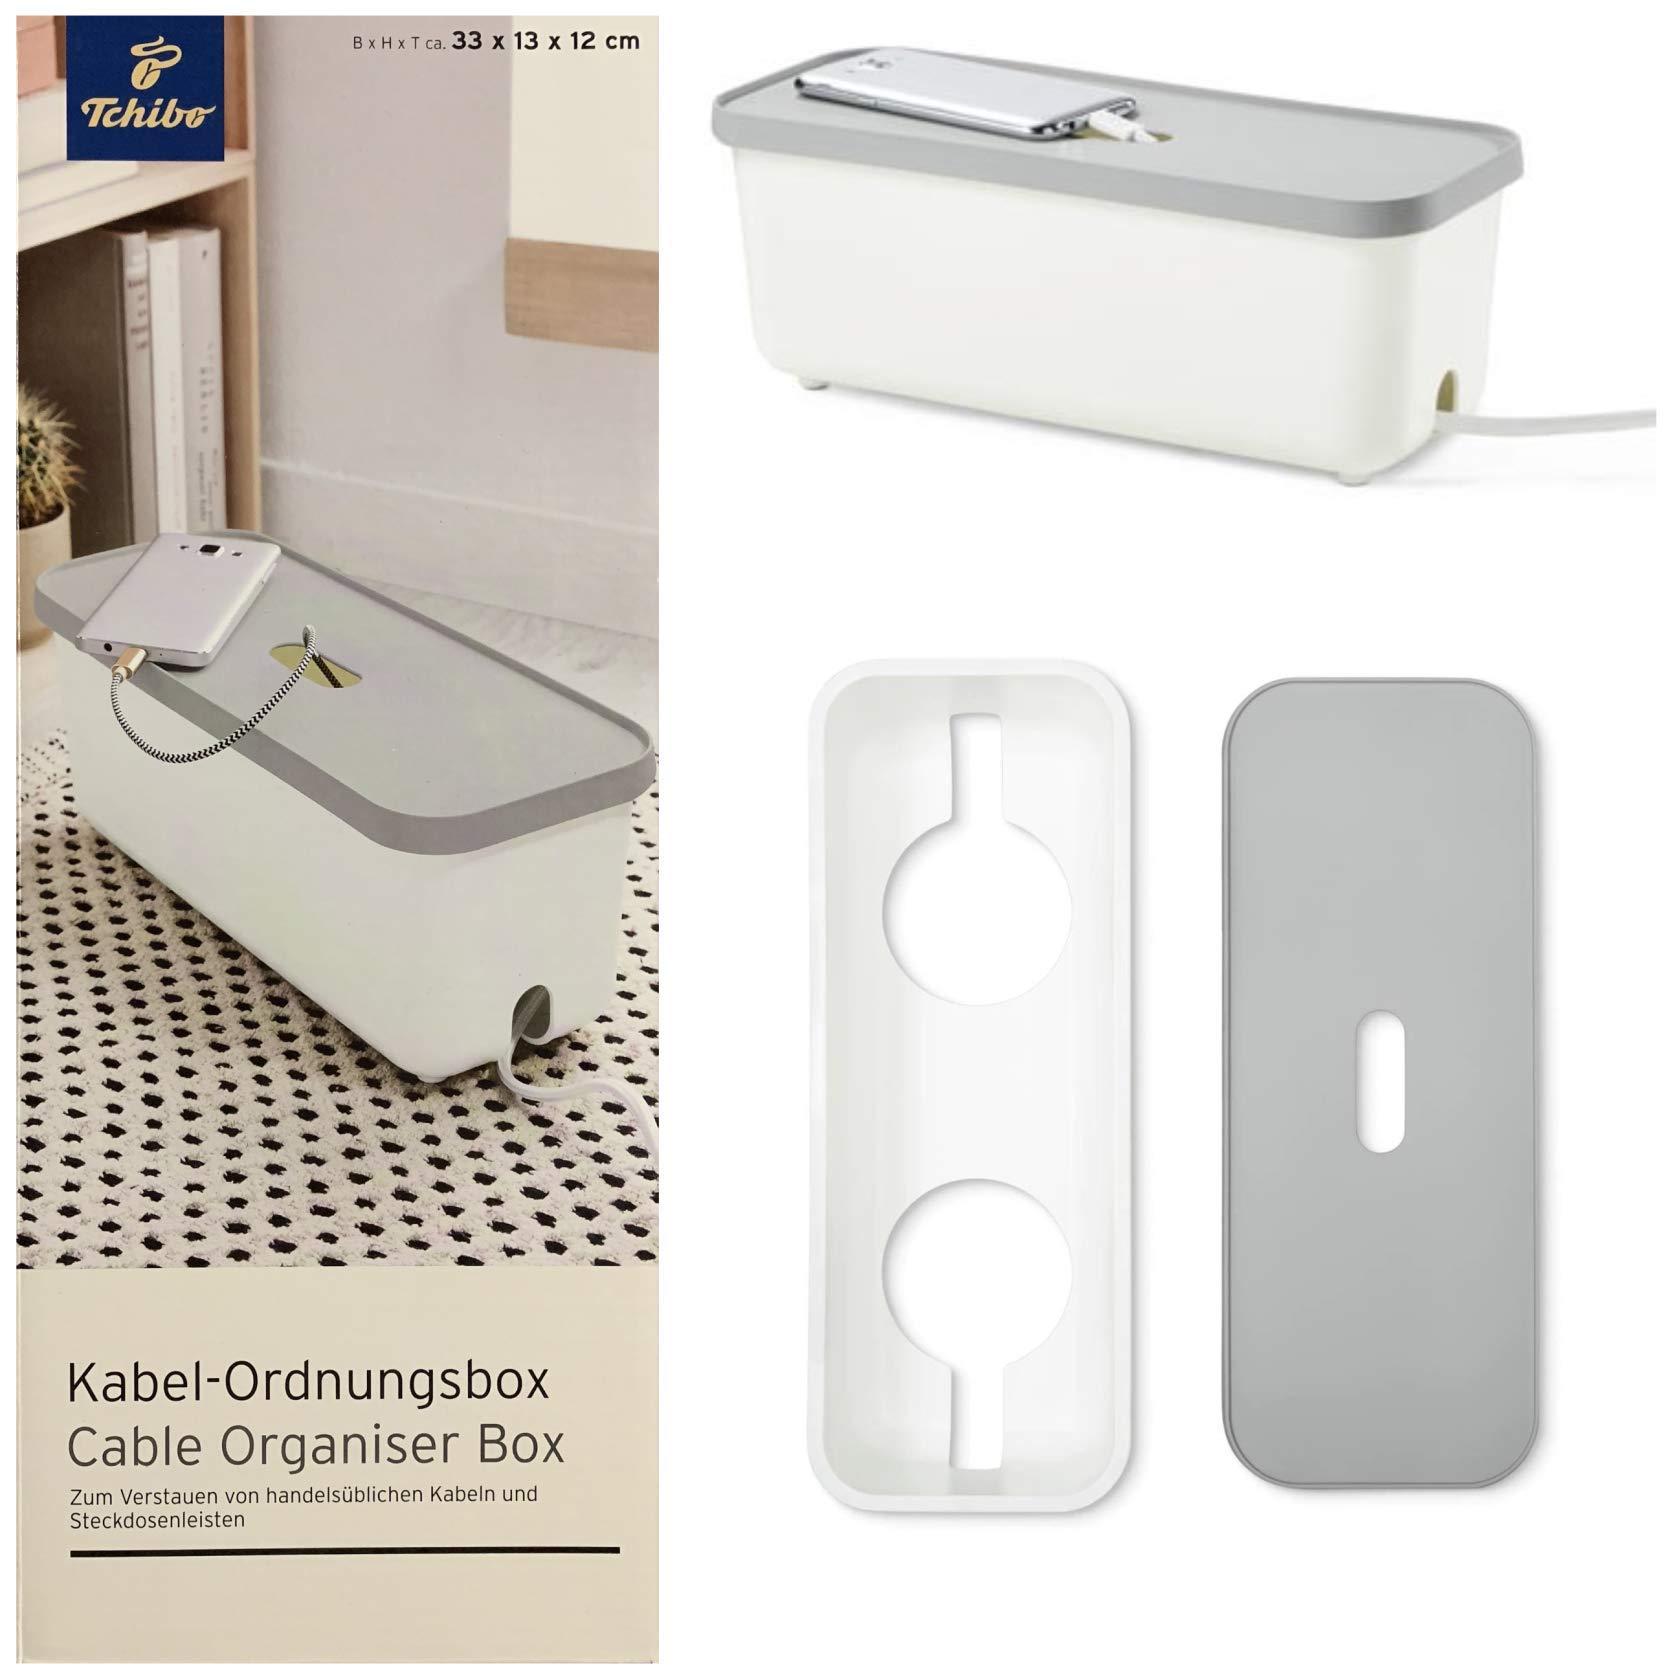 TCM Tchibo Cable ordnungs Box – Caja regleta enchufes Cajas Tamaño: Aprox. 33 x 13 x 11 cm: Amazon.es: Electrónica